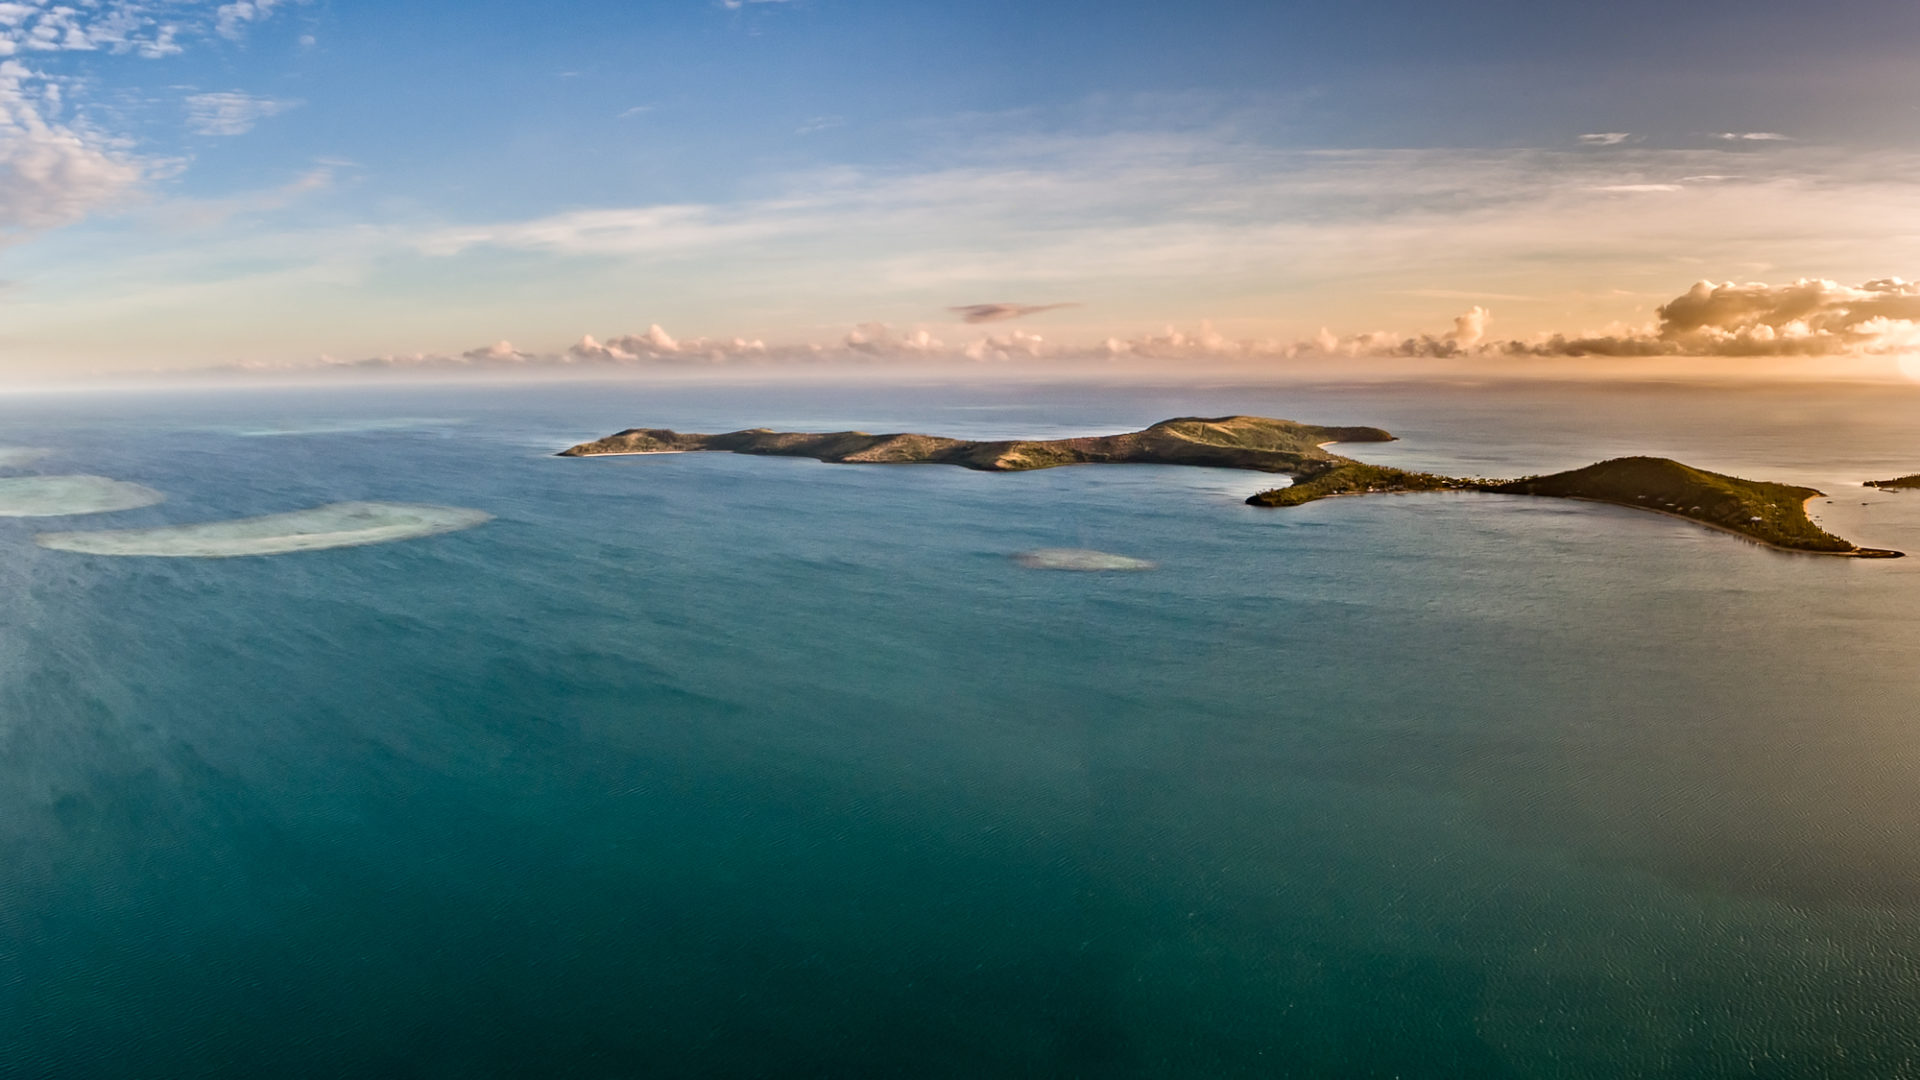 Fijian sunset, Phantom 4